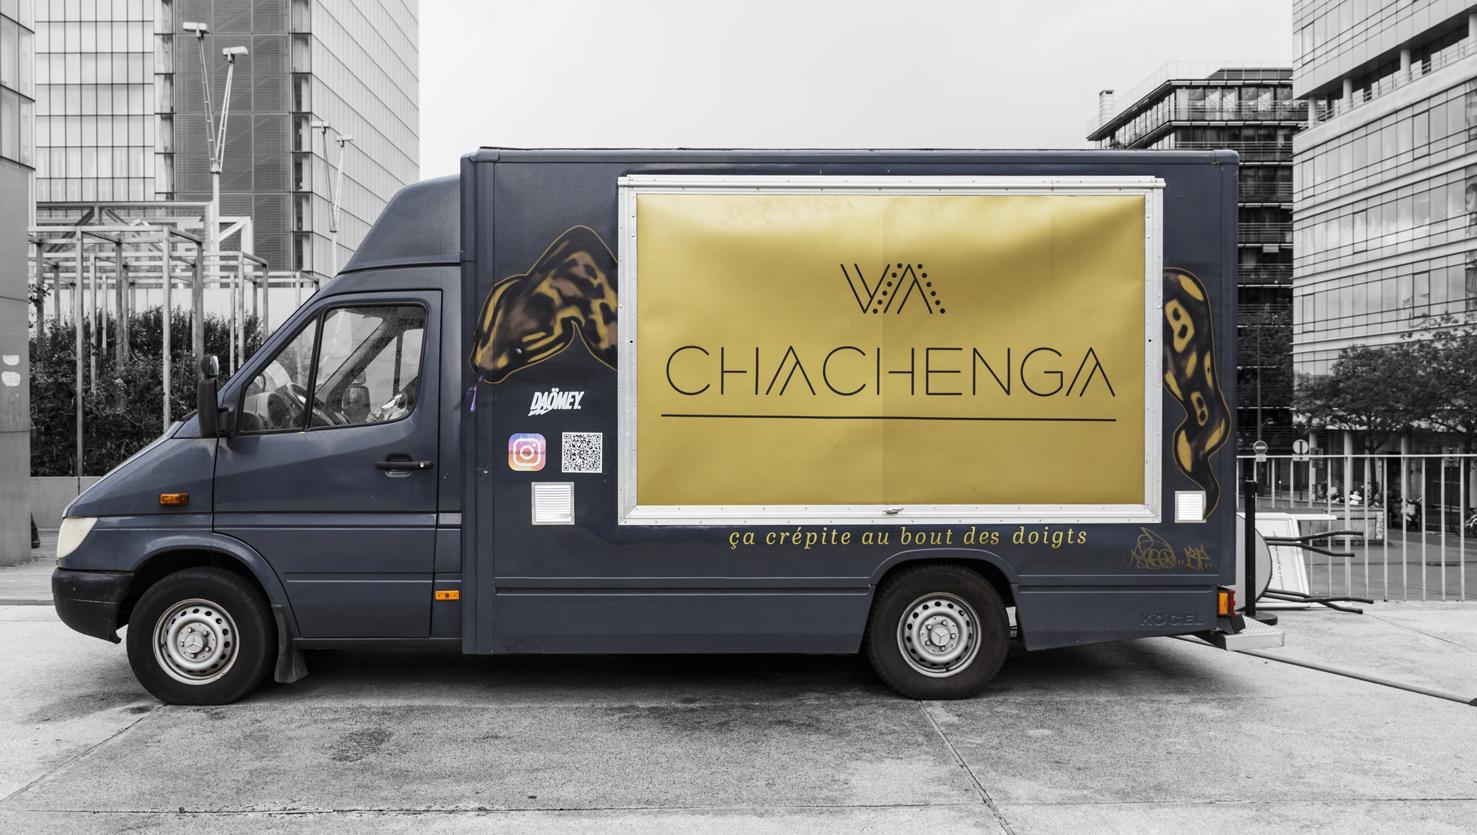 camion de food truck chachenga, restauration béninoisea